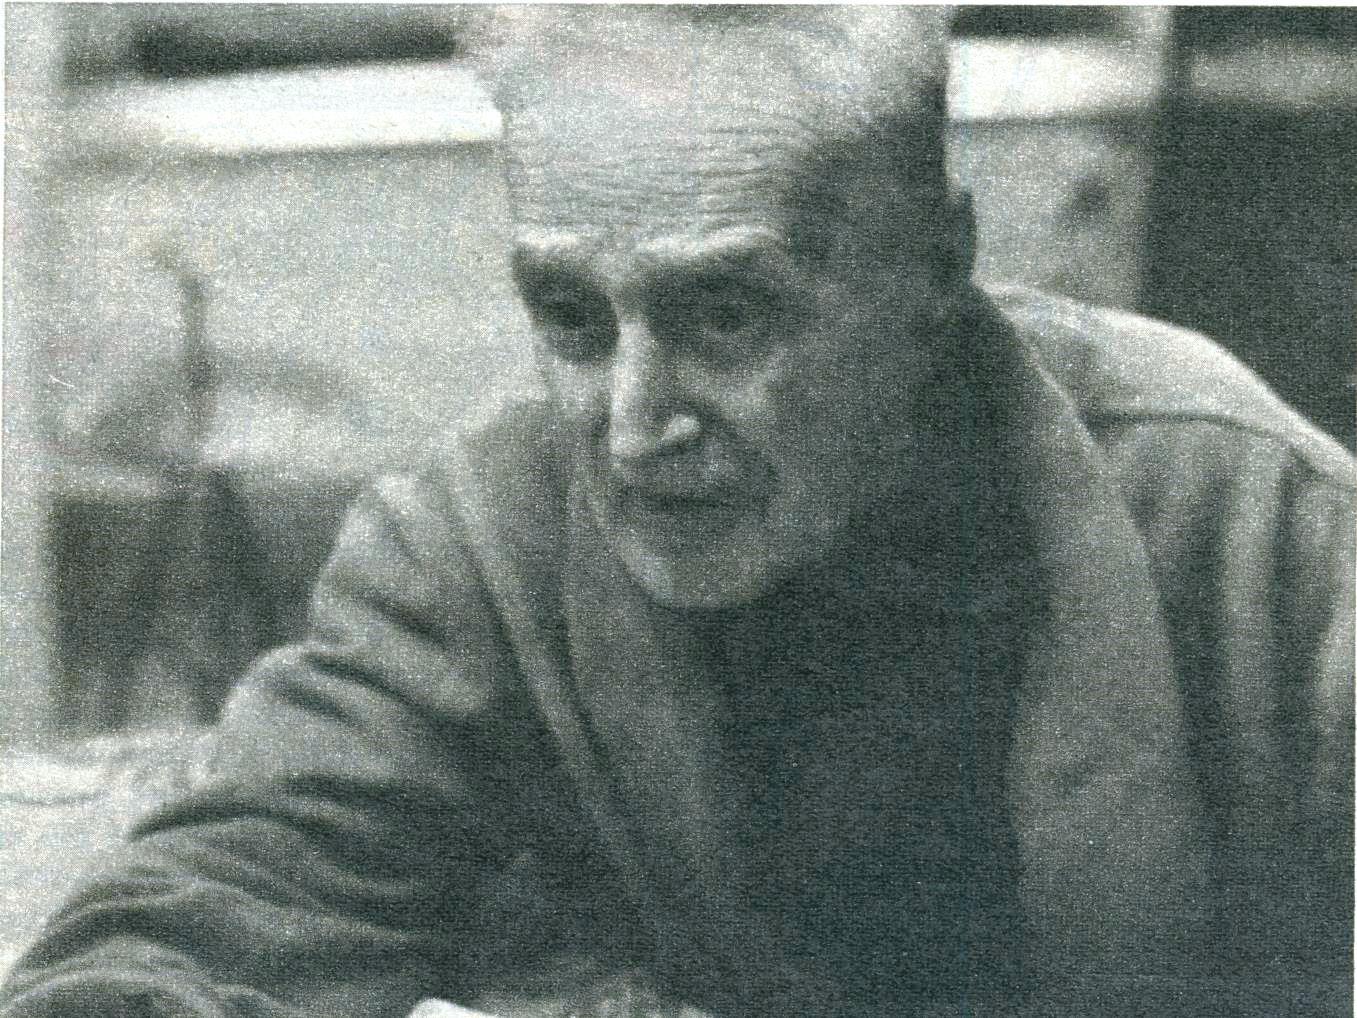 Paolo Mariani 2